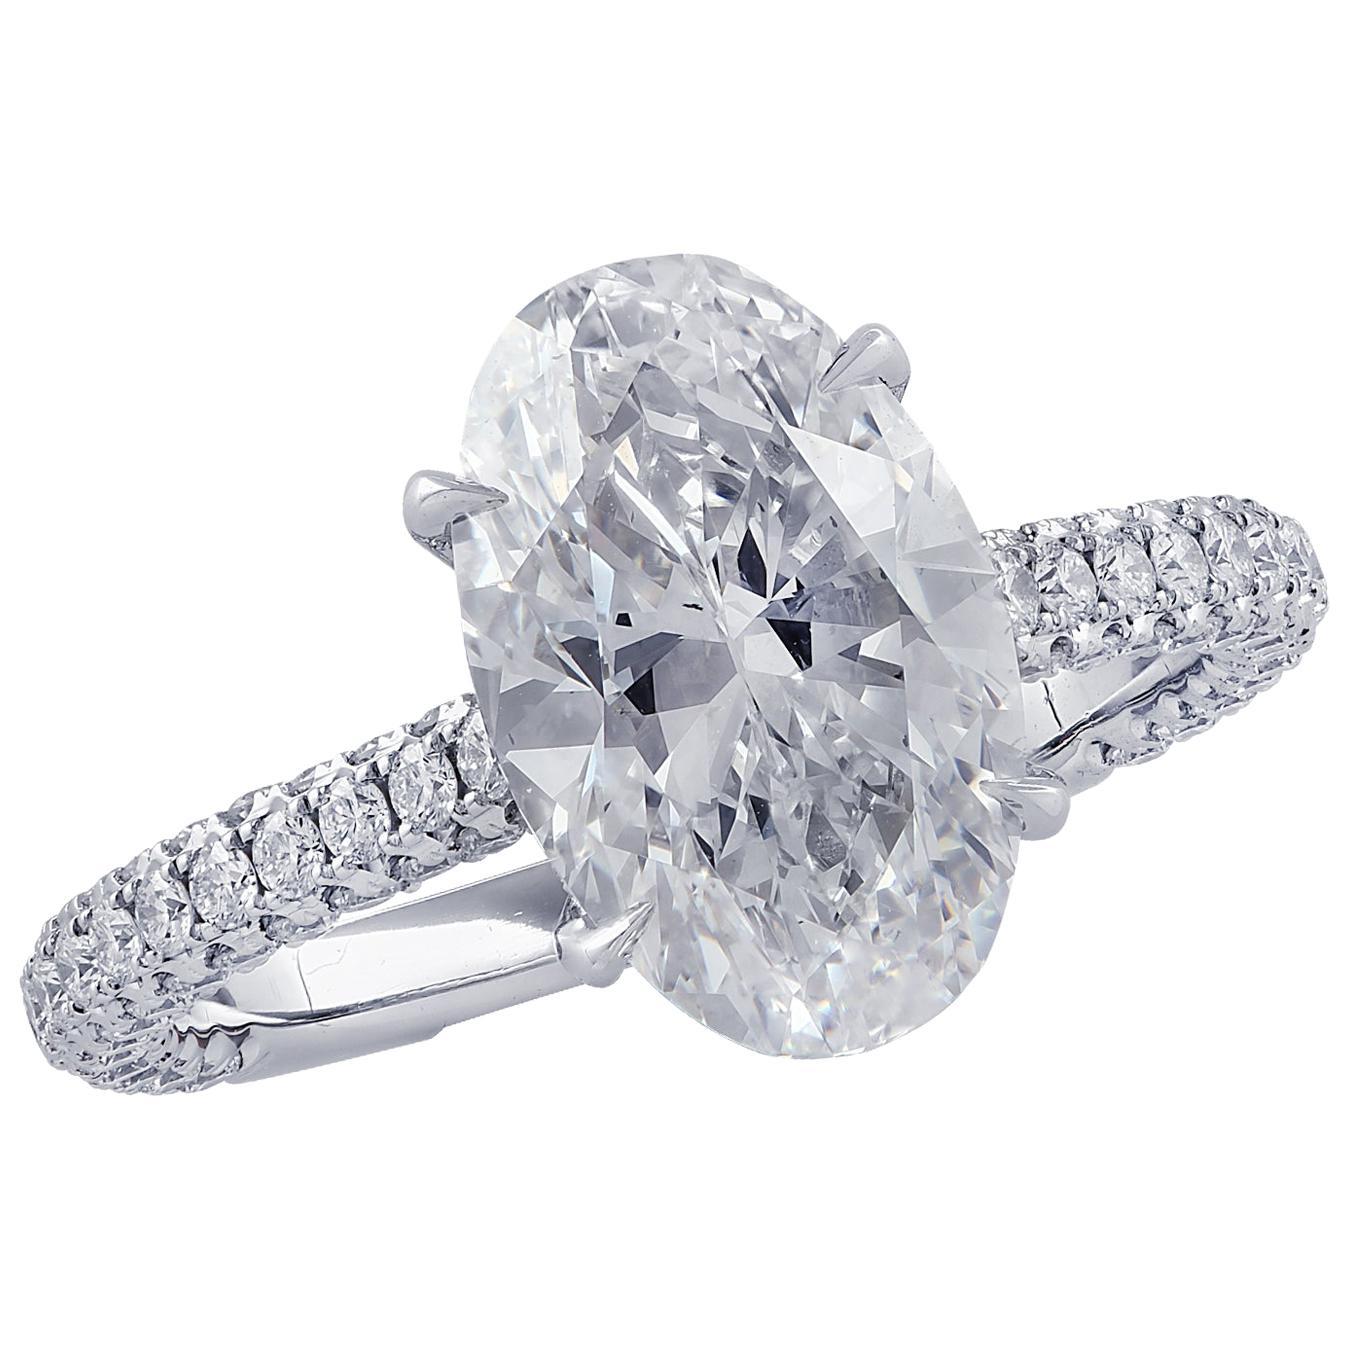 Vivid Diamonds GIA Certified 3.28 Carat Diamond Engagement Ring